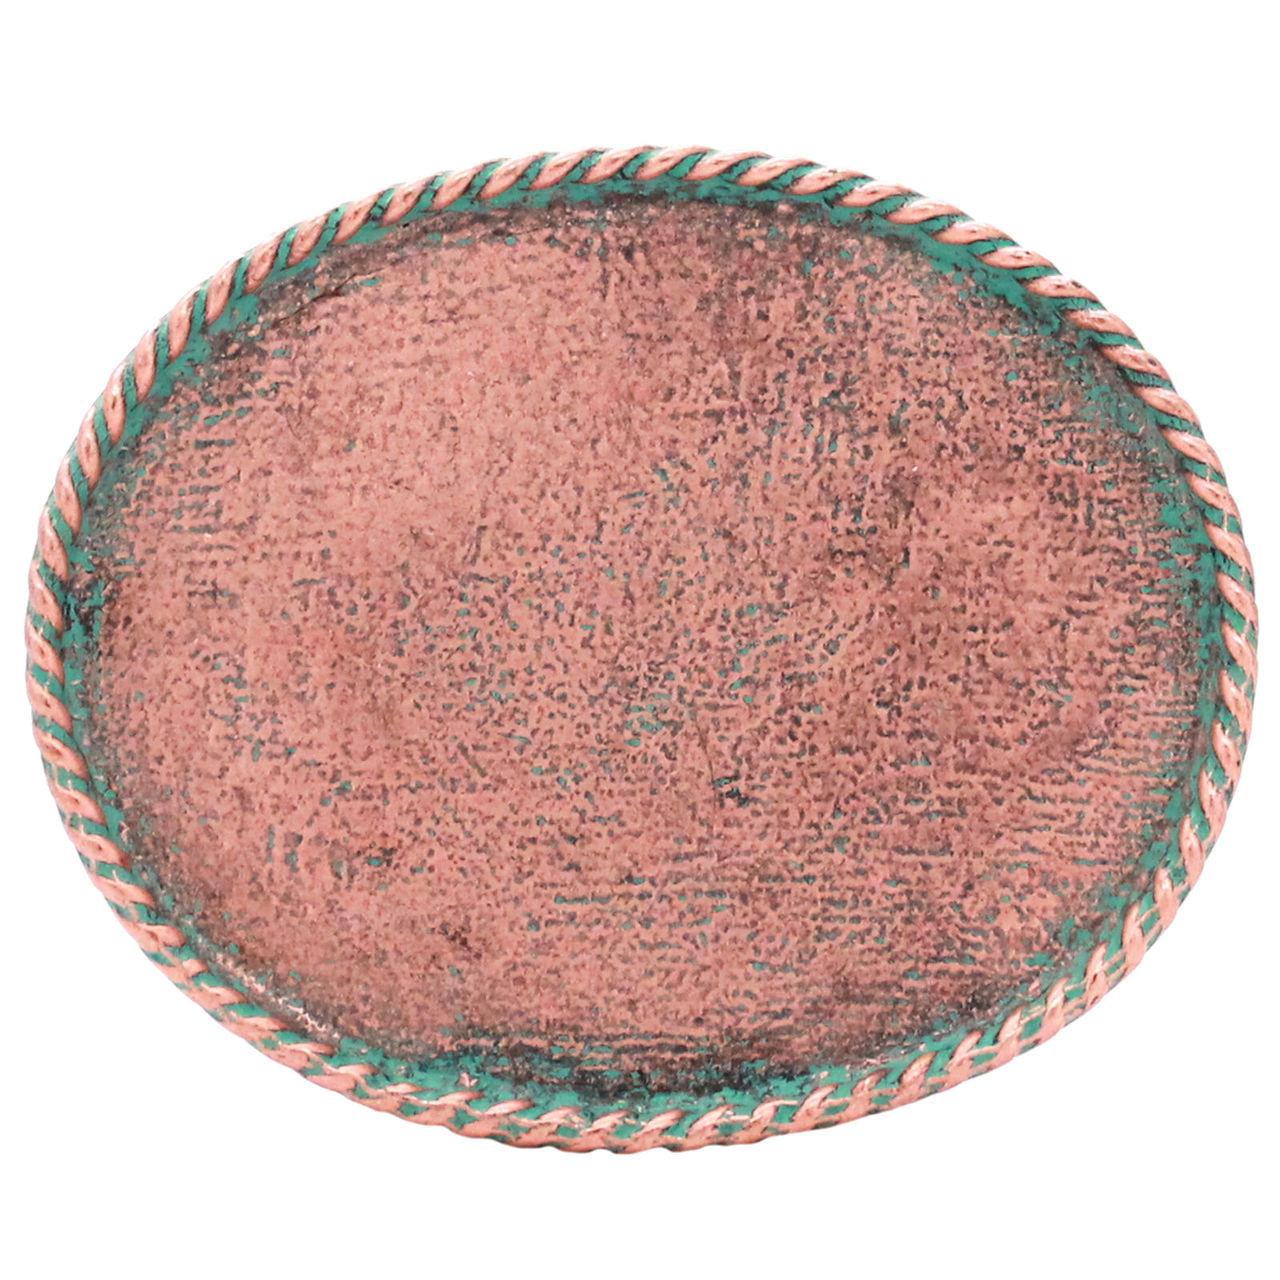 Creatieve hobby's Celtic Trophy Belt Buckle Antique Copper Patina 6012-90 3.0 x 2.5